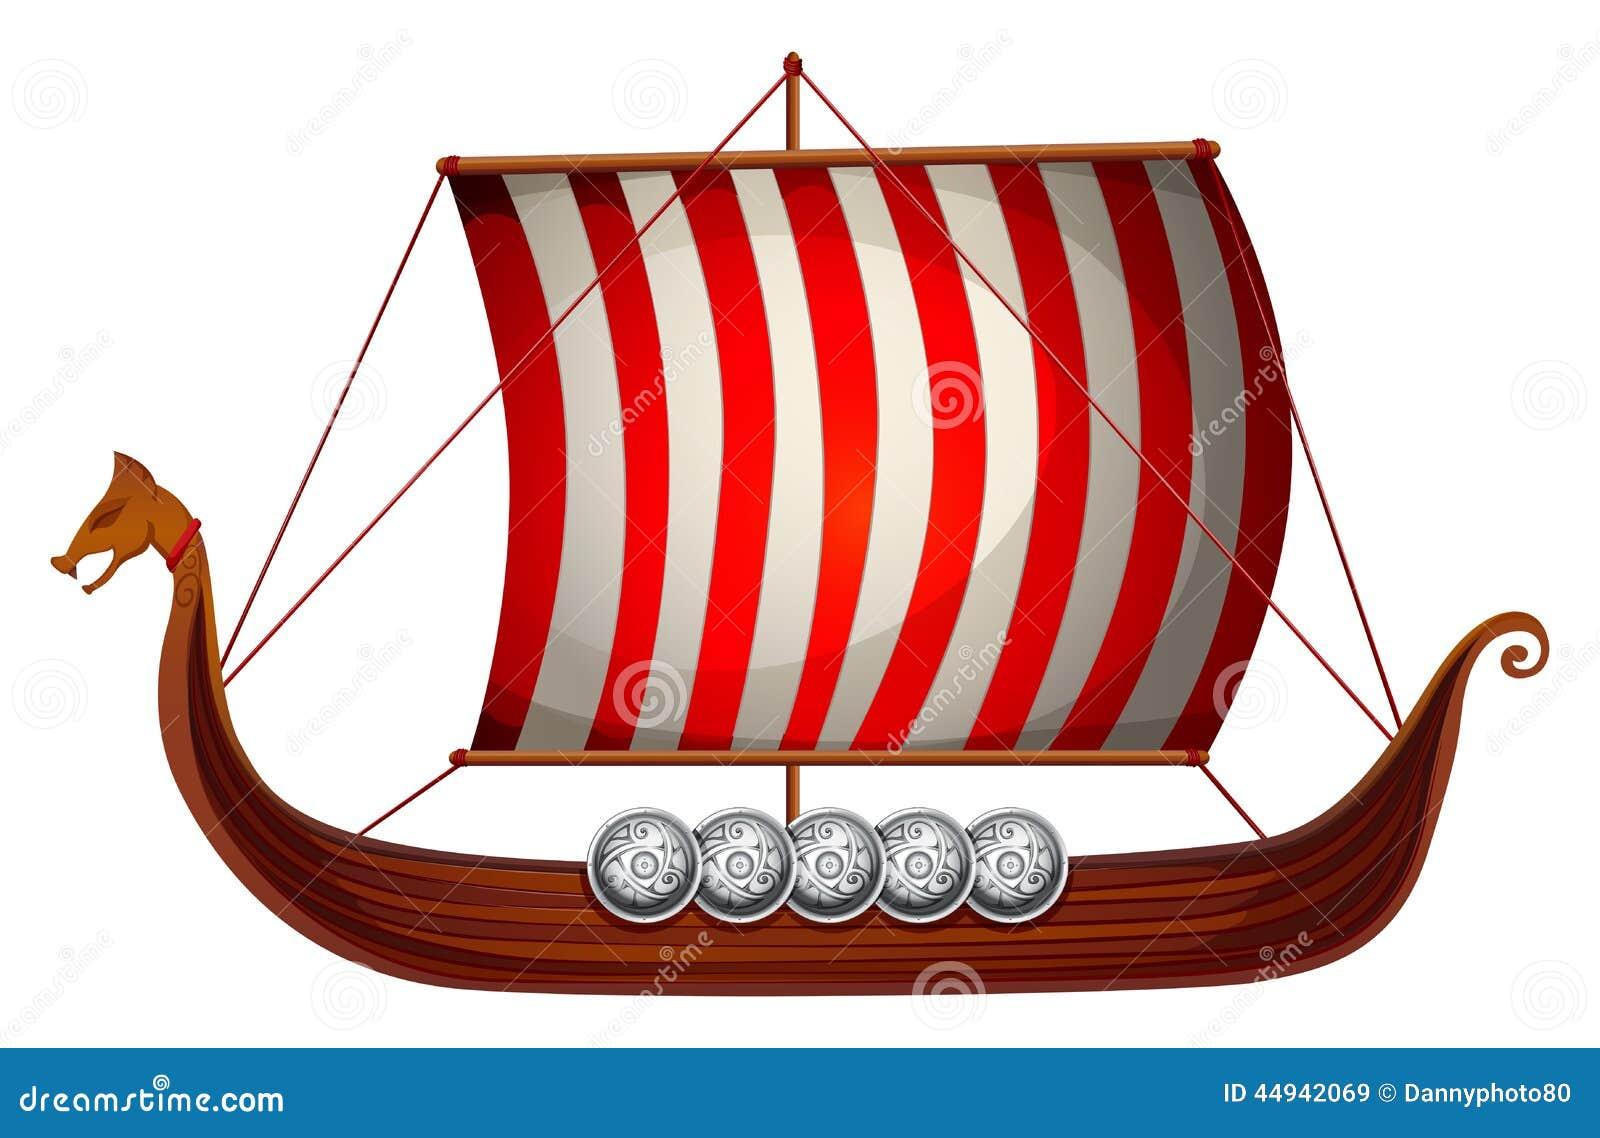 Viking Ship Art Images